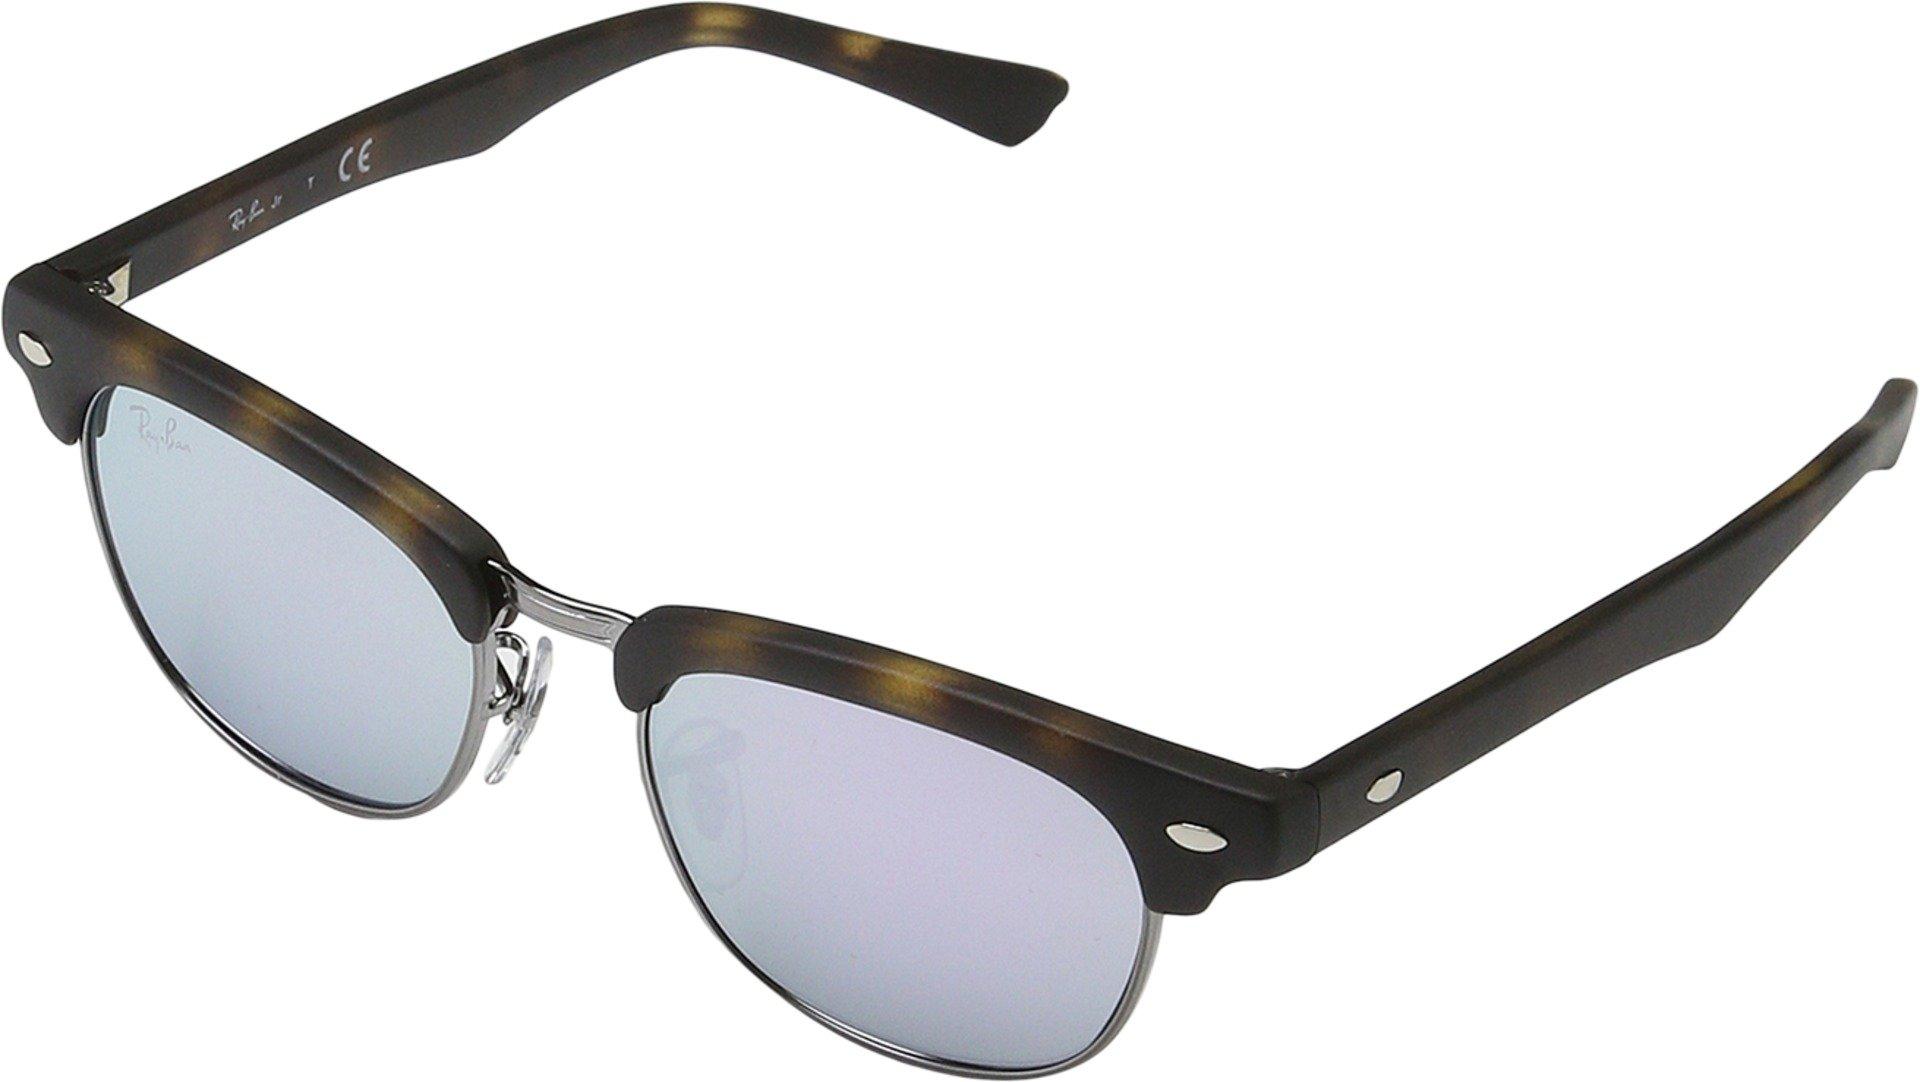 Ray-Ban Jr. Kids Clubmaster Kids Sunglasses (RJ9050) Tortoise Matte/Purple Metal - Non-Polarized - 45mm